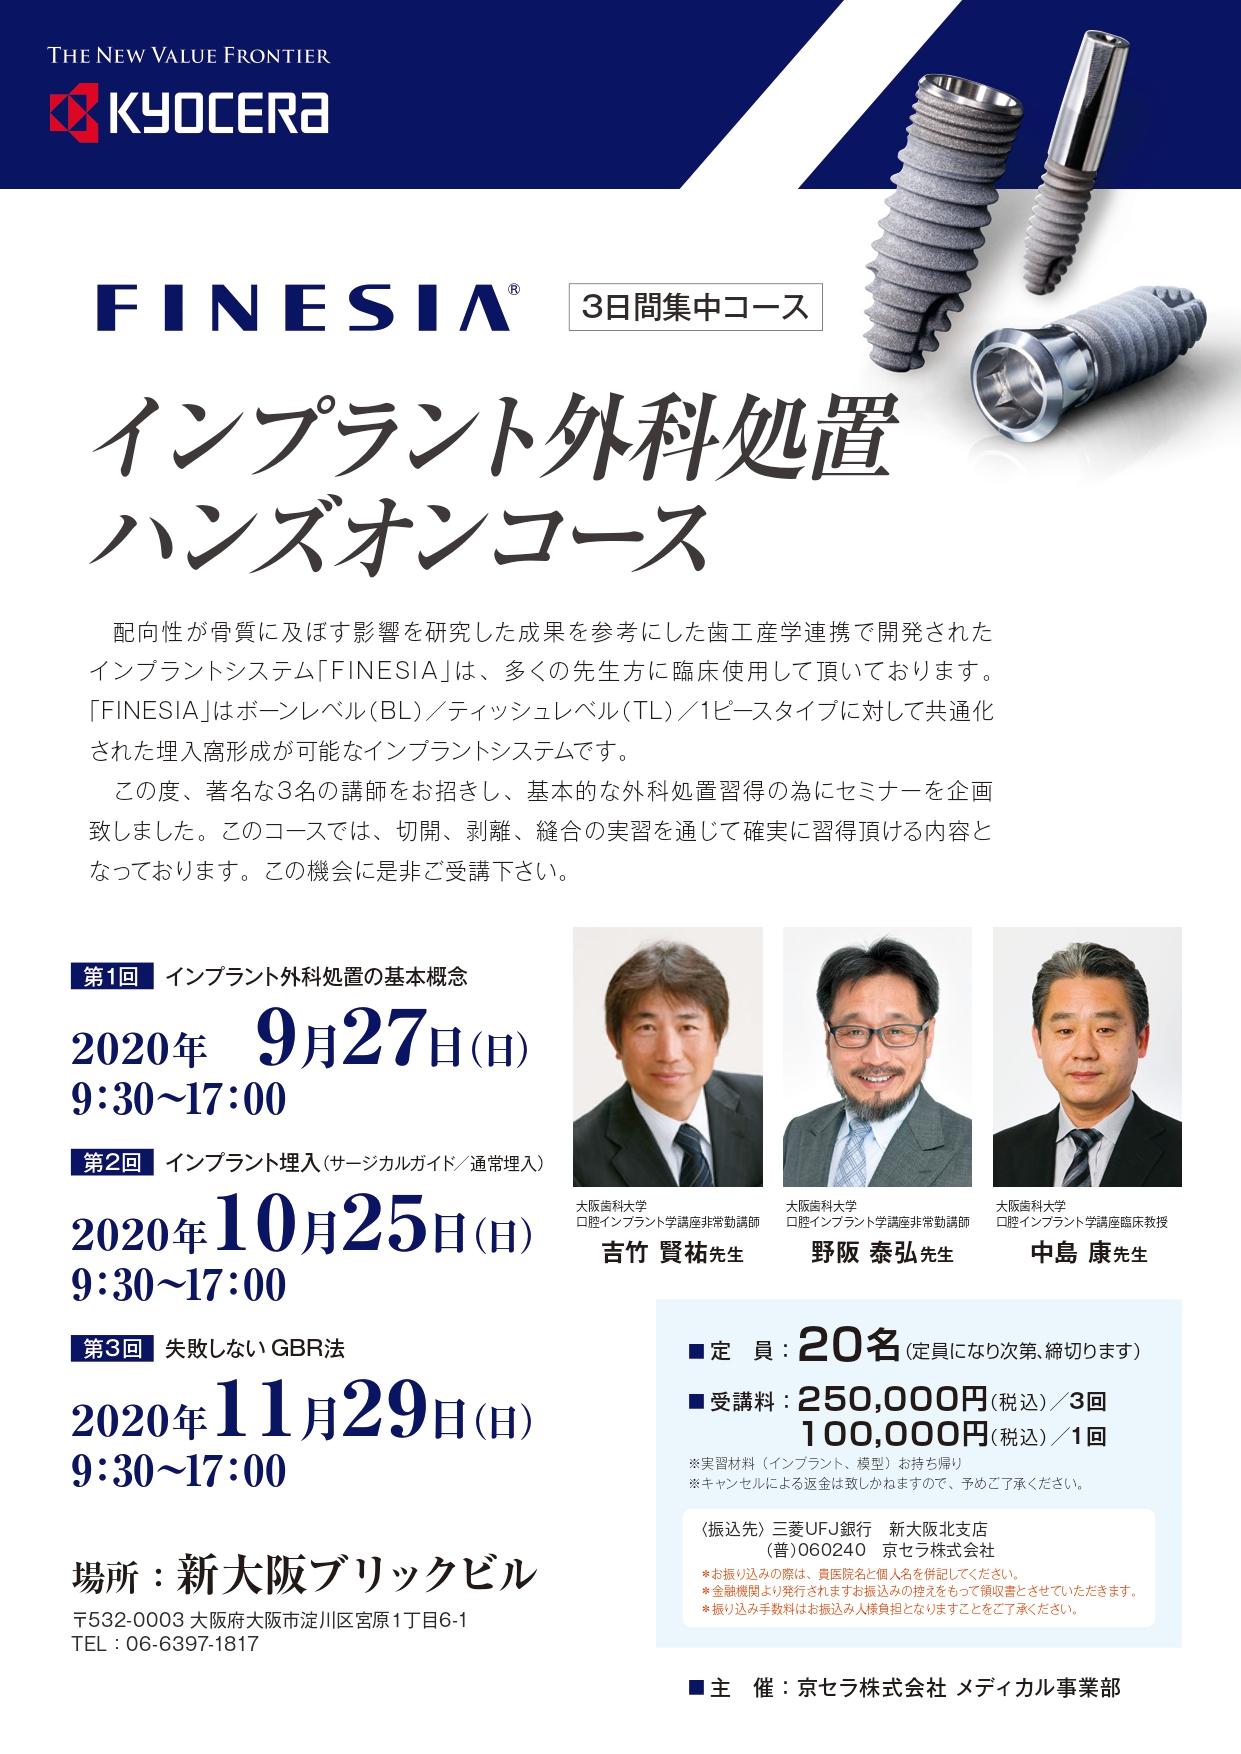 FINESIA インプラント外科処置  ハンズオンコース ~3日間集中コース~